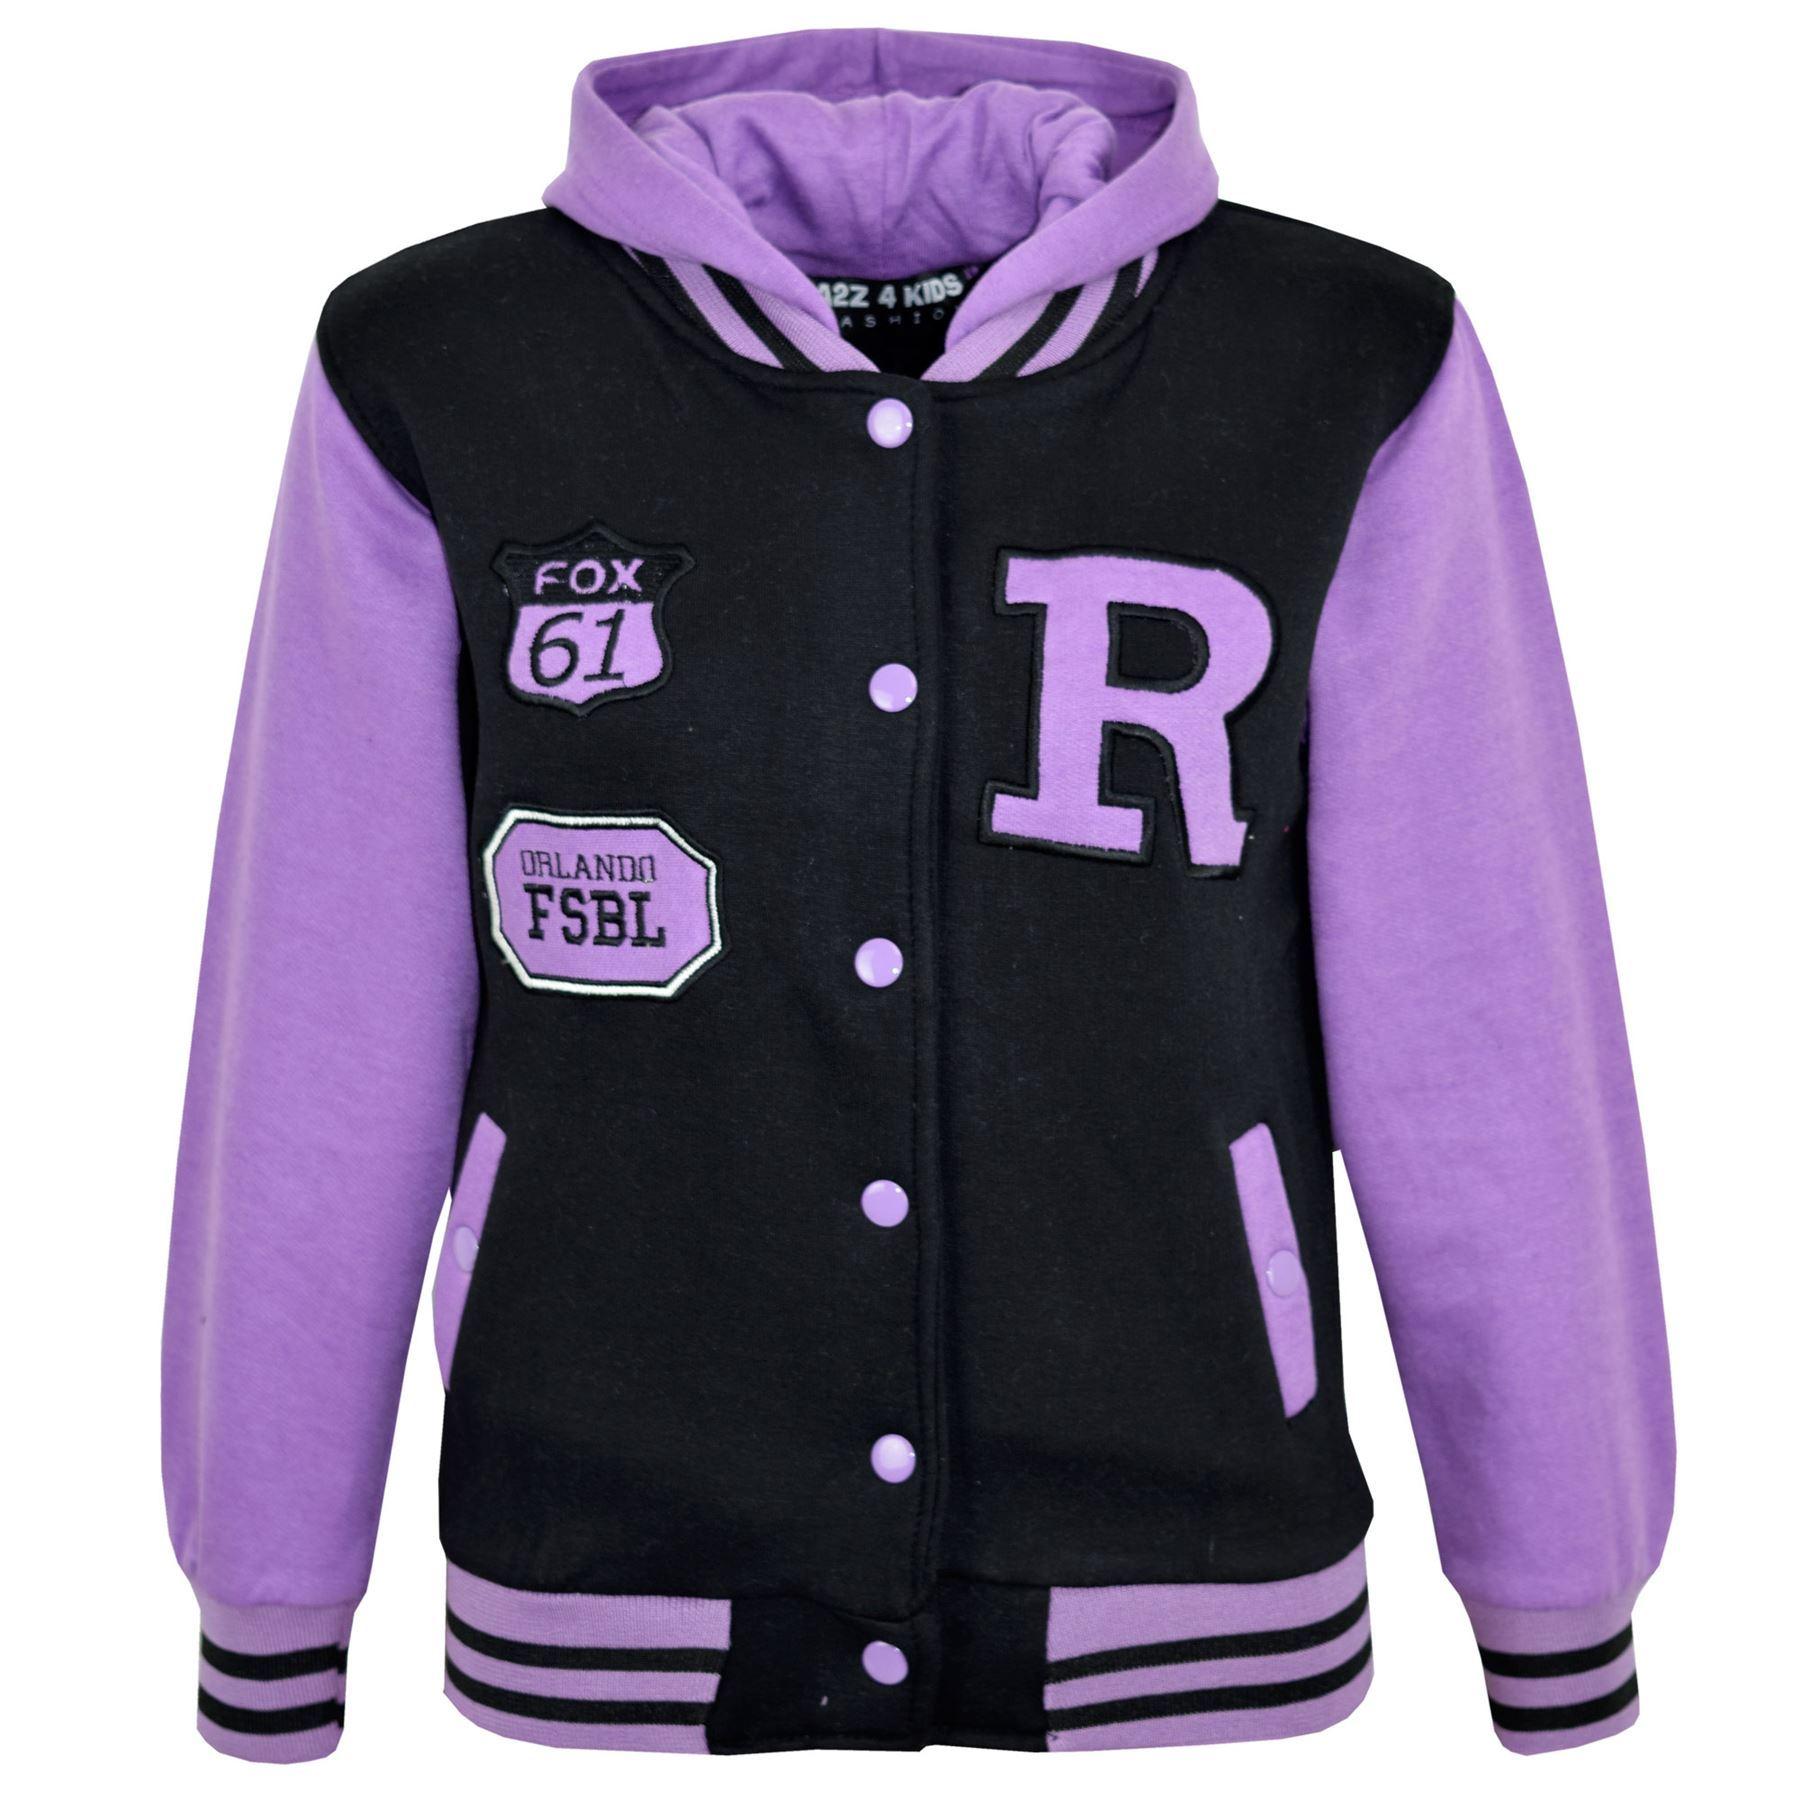 Kids Girls Boys R Fashion FOX Baseball Hooded Jacket Varsity Hoodie 5-13 Years | EBay